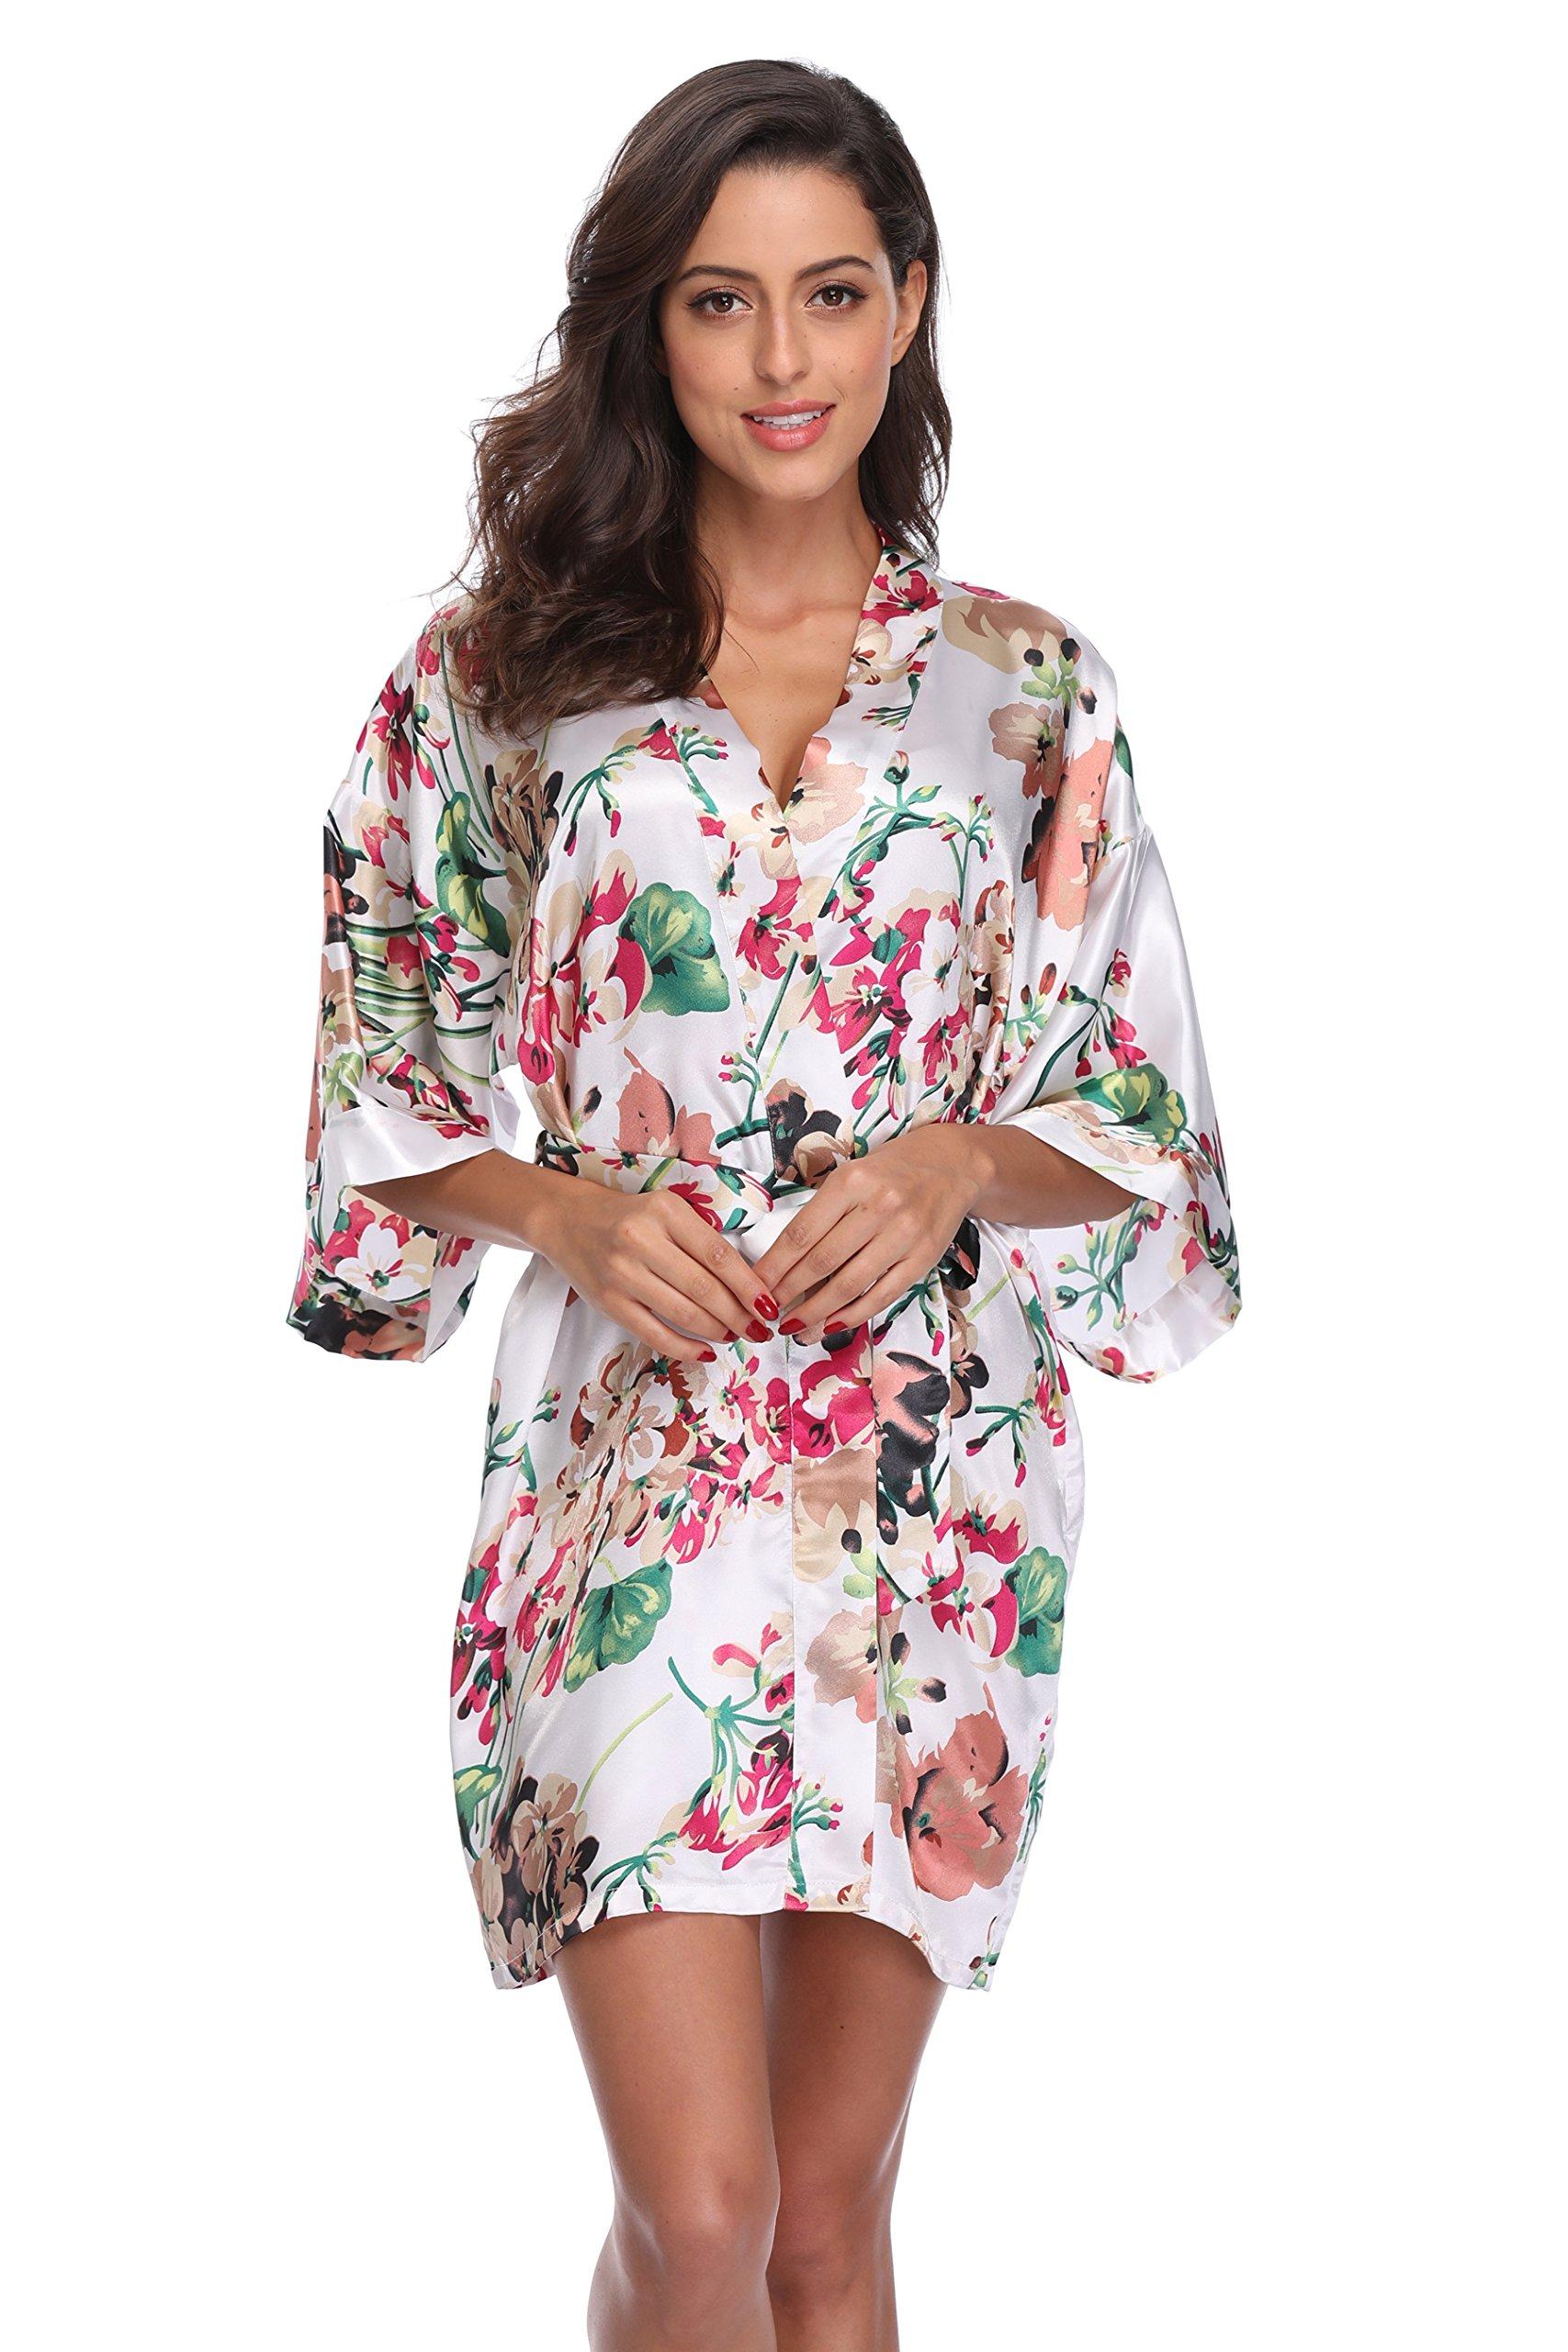 CostumeDeals KimonoDeals Women's dept Satin Bathrobe Floral Short Kimono Robe for Bridesmaid Wedding Party, White XL